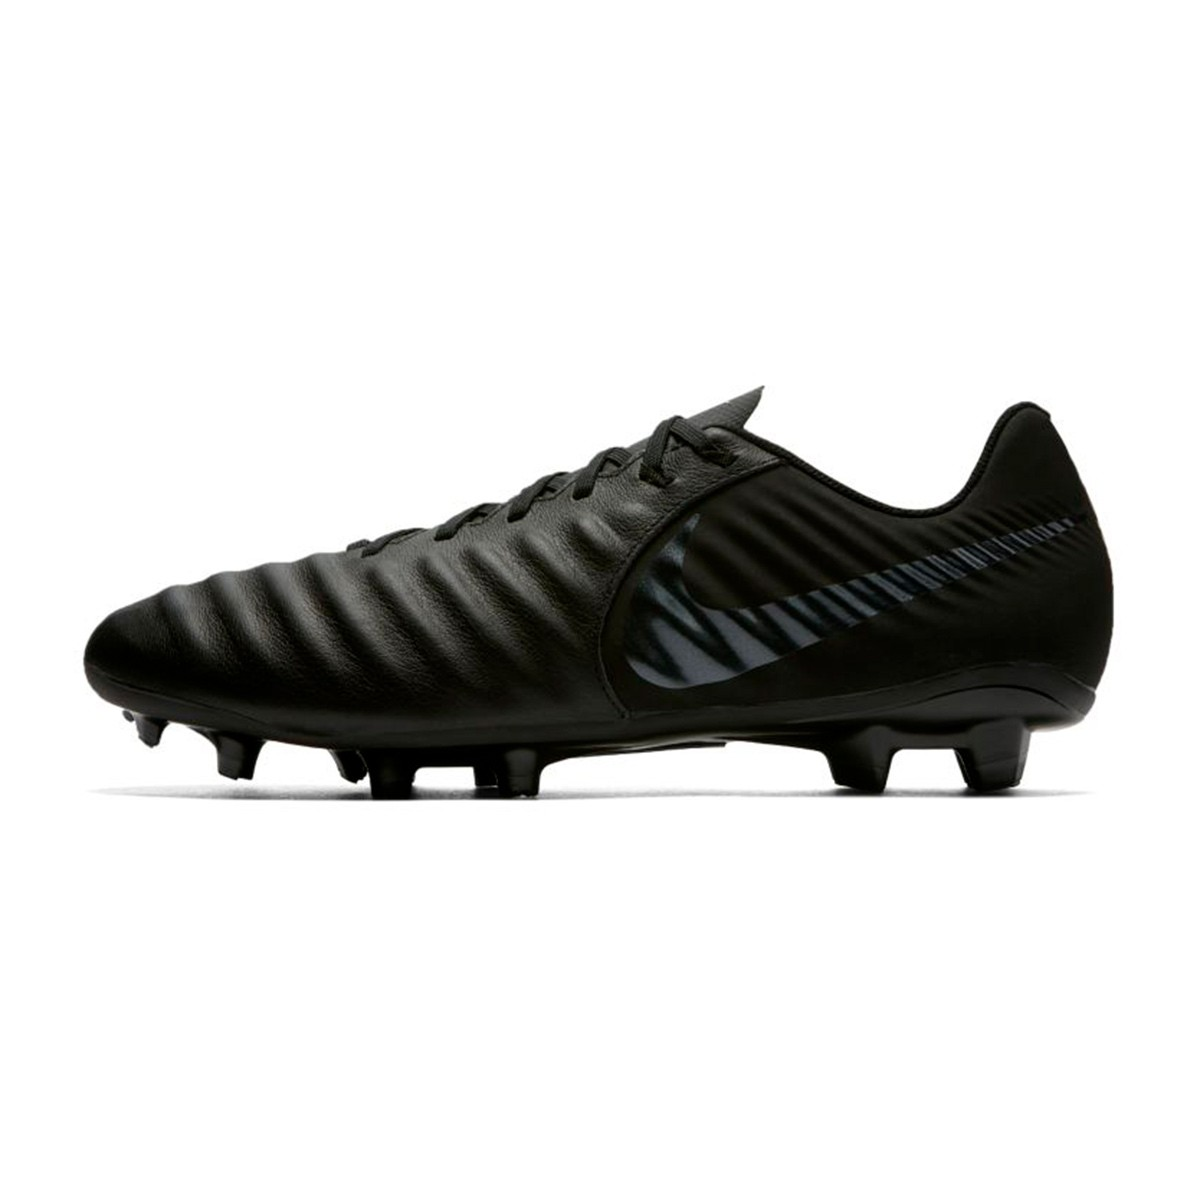 d57b8732111 Football Boots Nike Tiempo Legend VII Academy FG Black - Football store  Fútbol Emotion